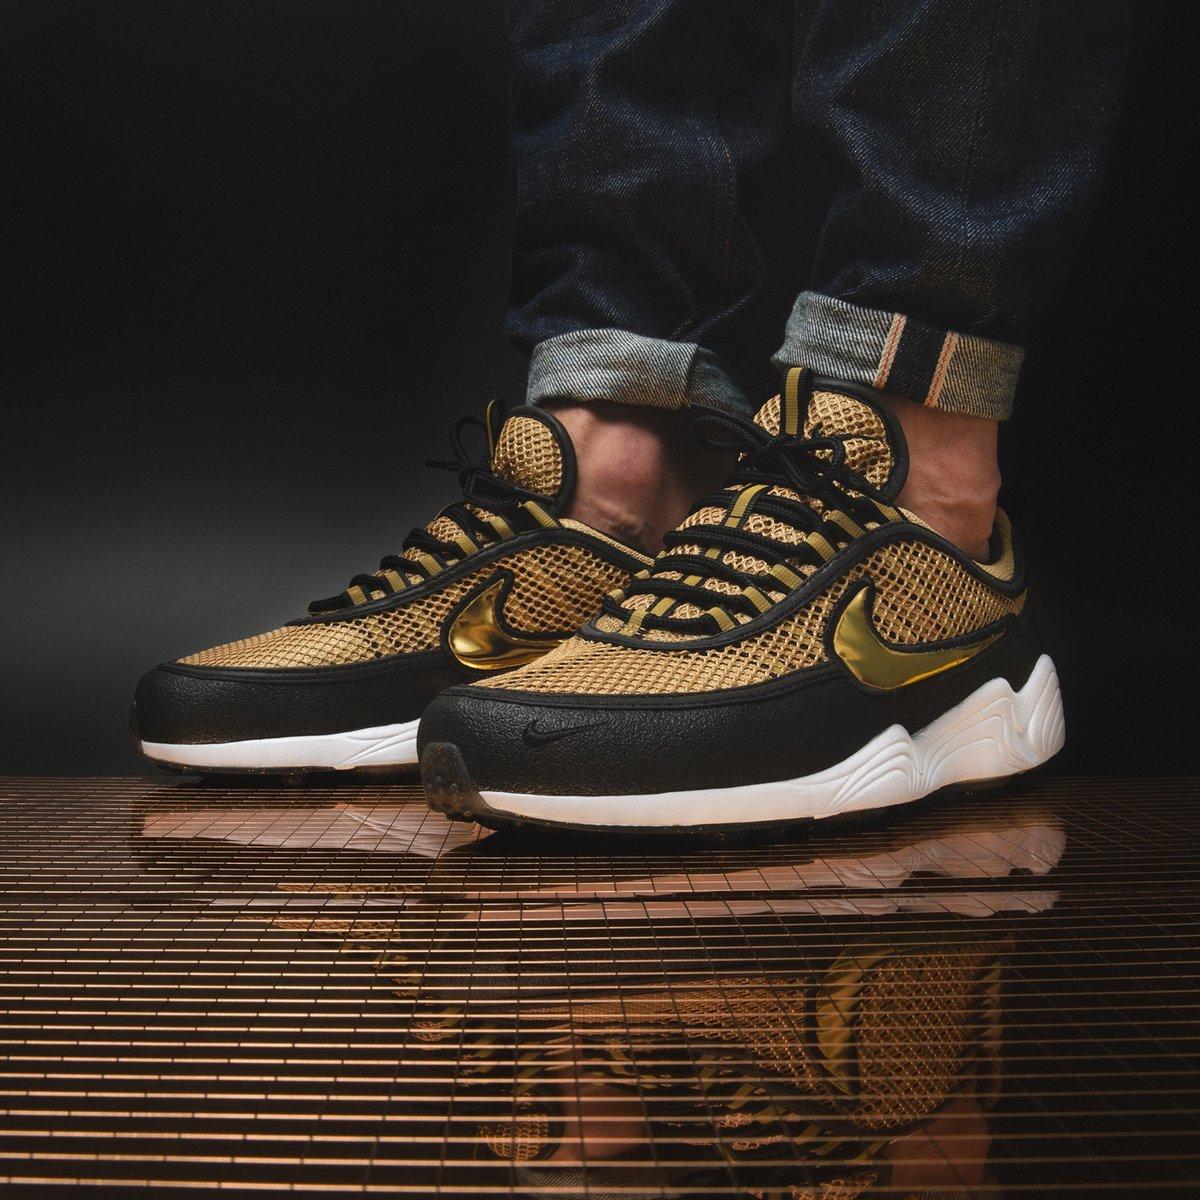 Los Angeles e662a 68a37 SneakerMash on Twitter: